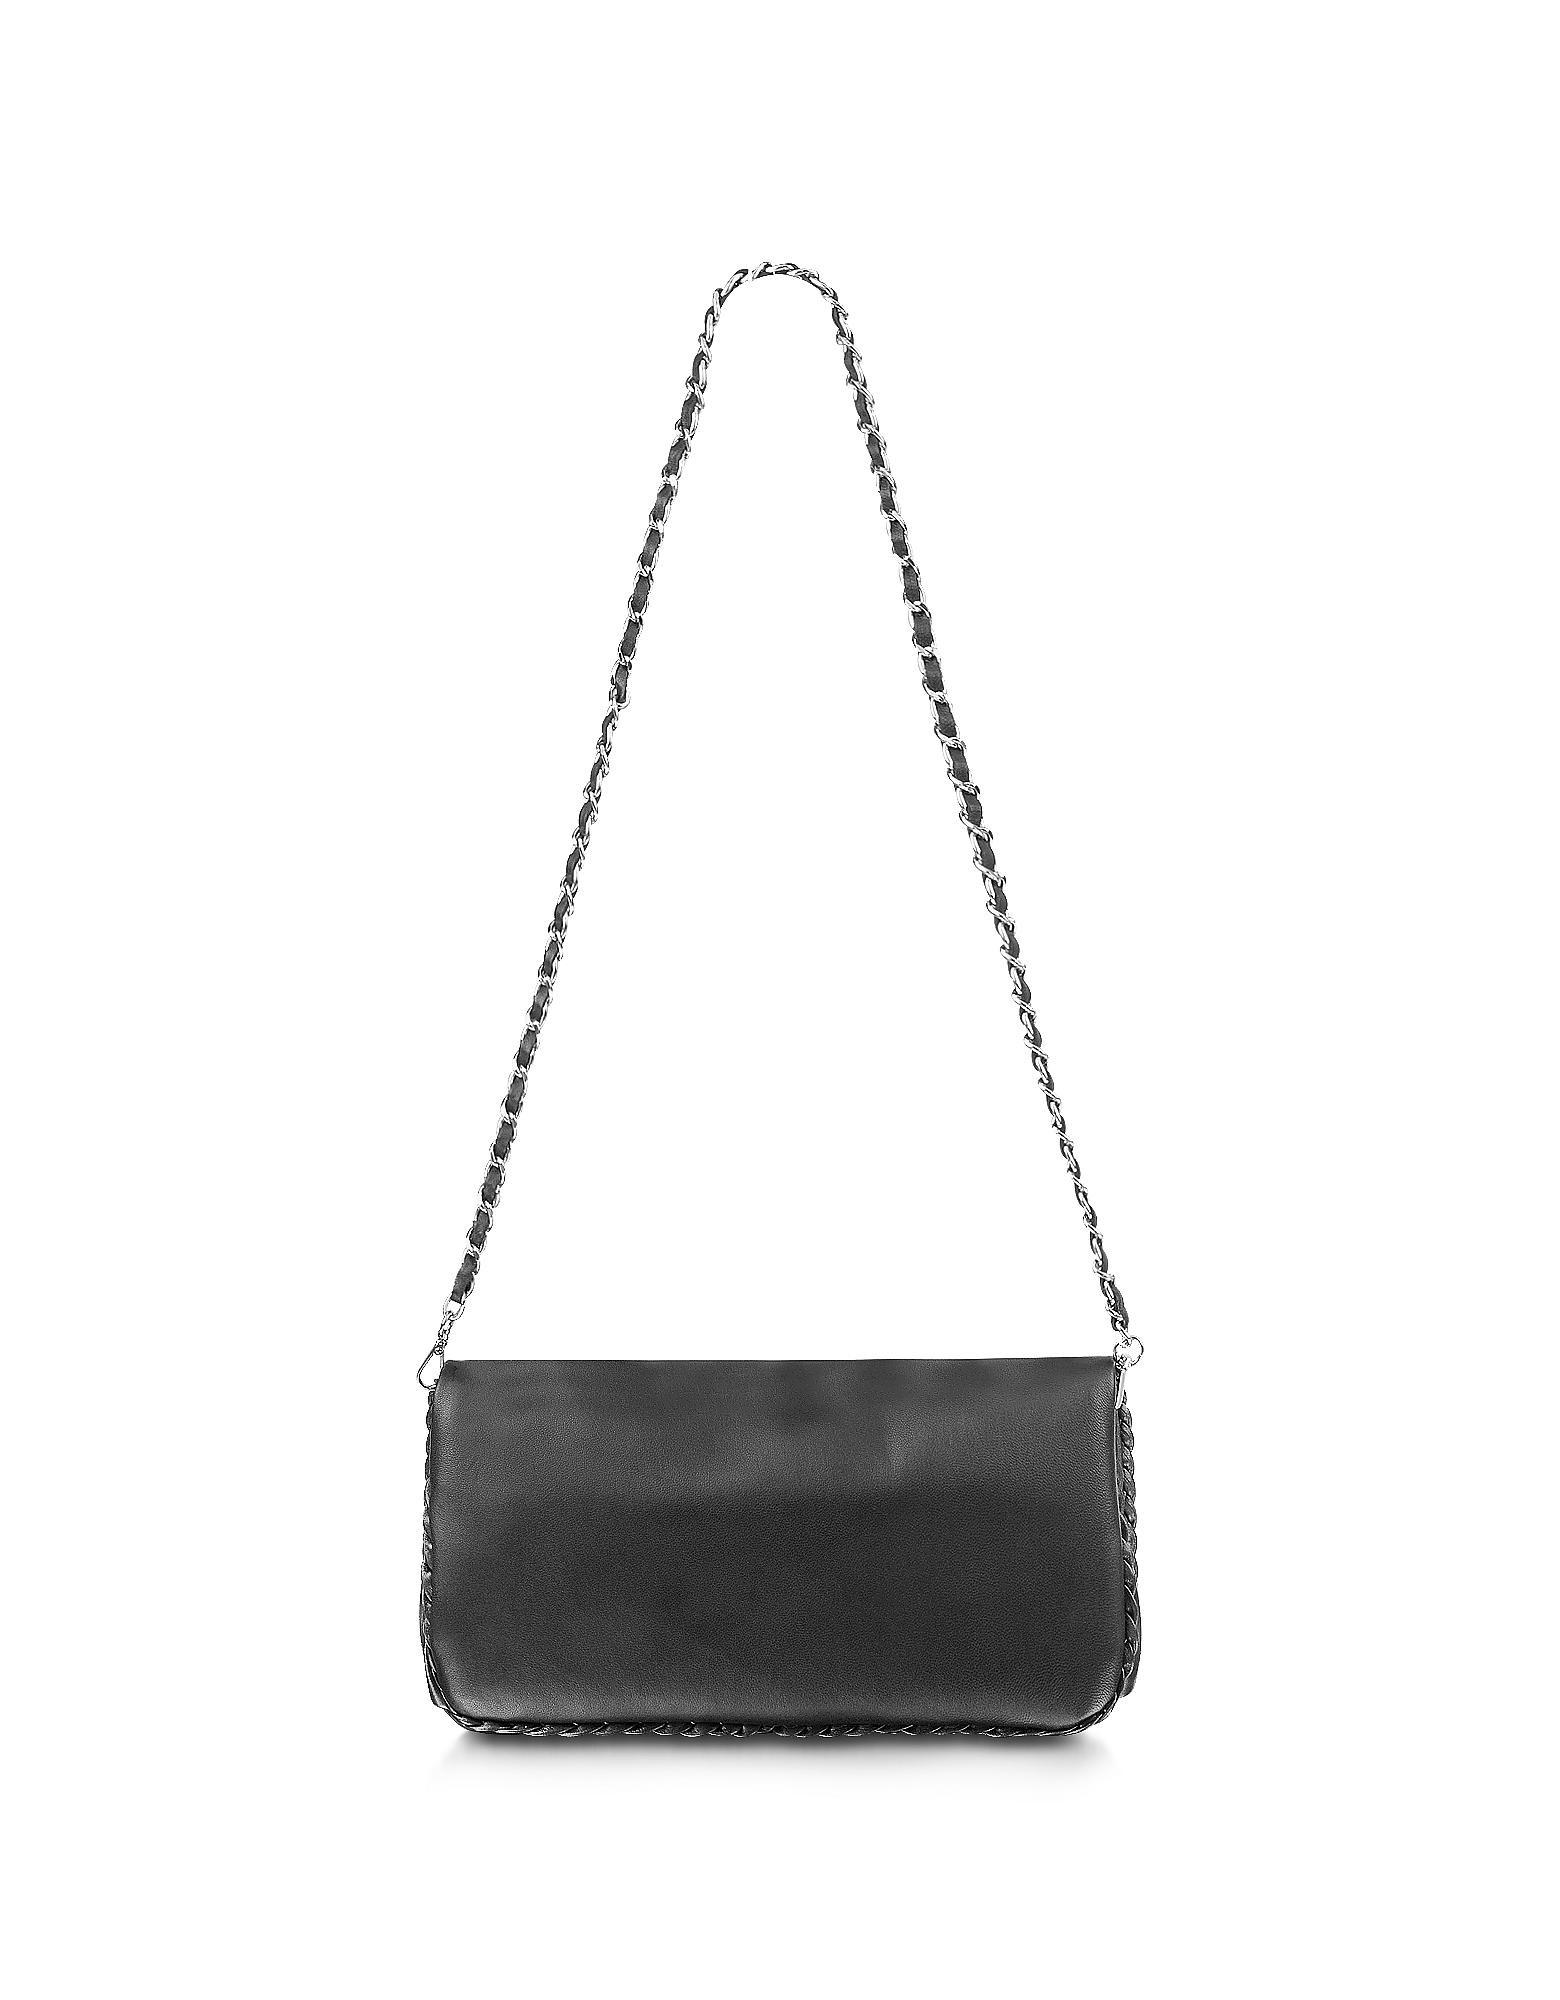 Fontanelli Handbags, Black Leather Baguette Bag